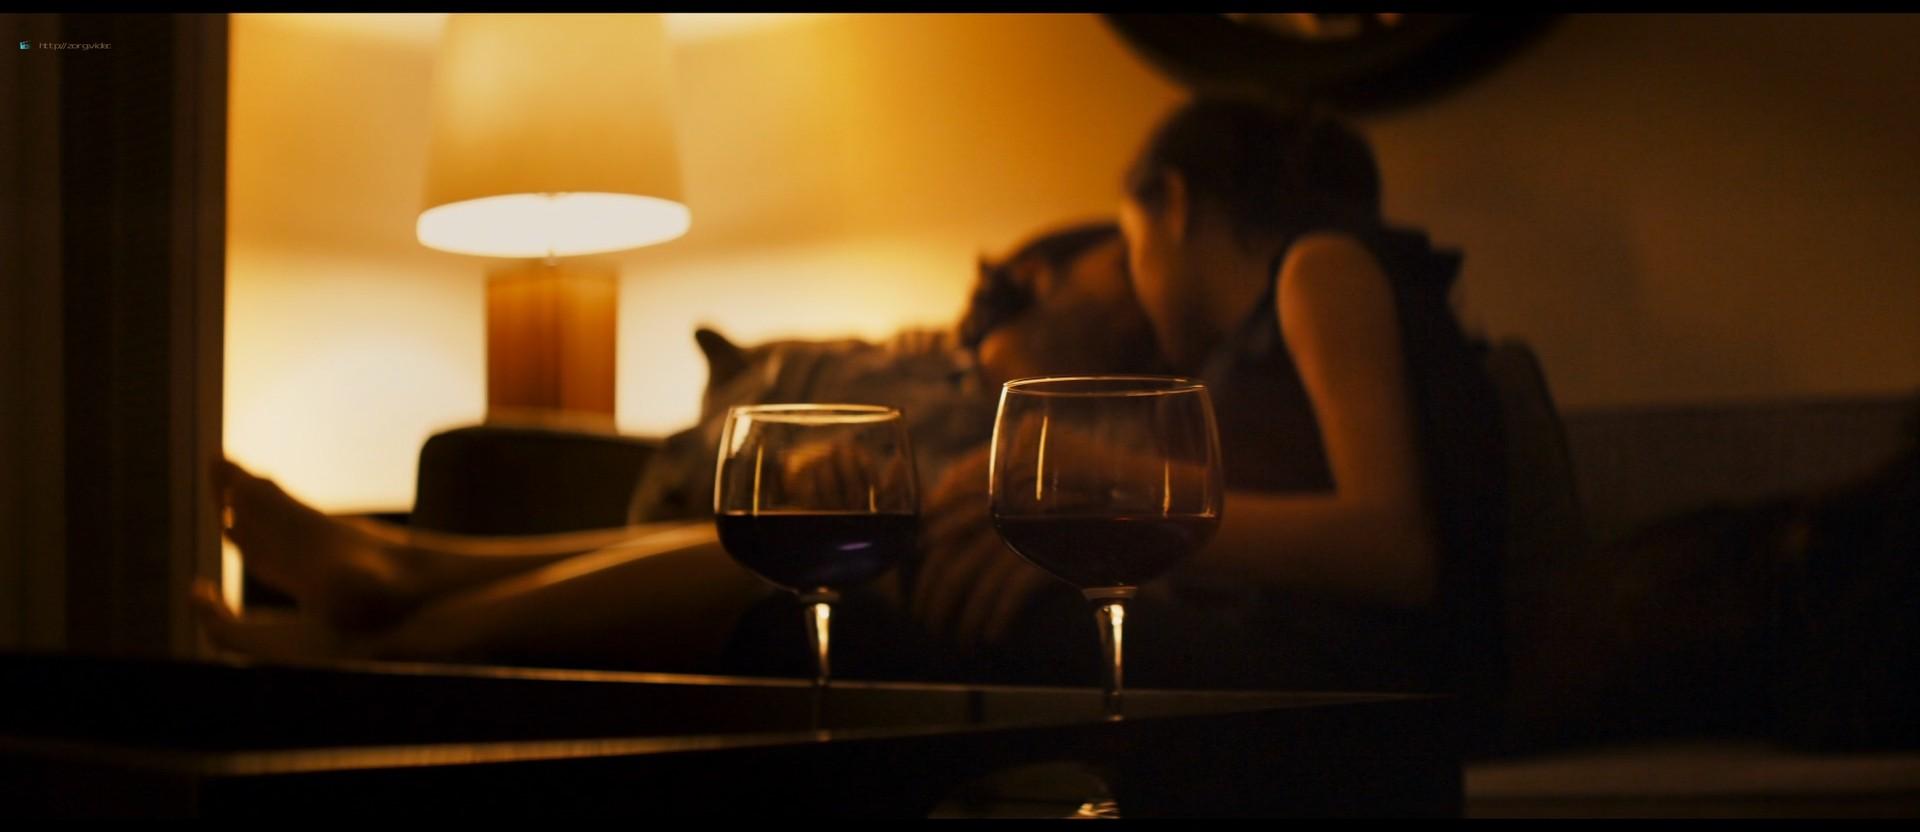 Sasha Grey nude full frontal - The Girlfriend Experience (2009) HD 1080p BluRay (11)